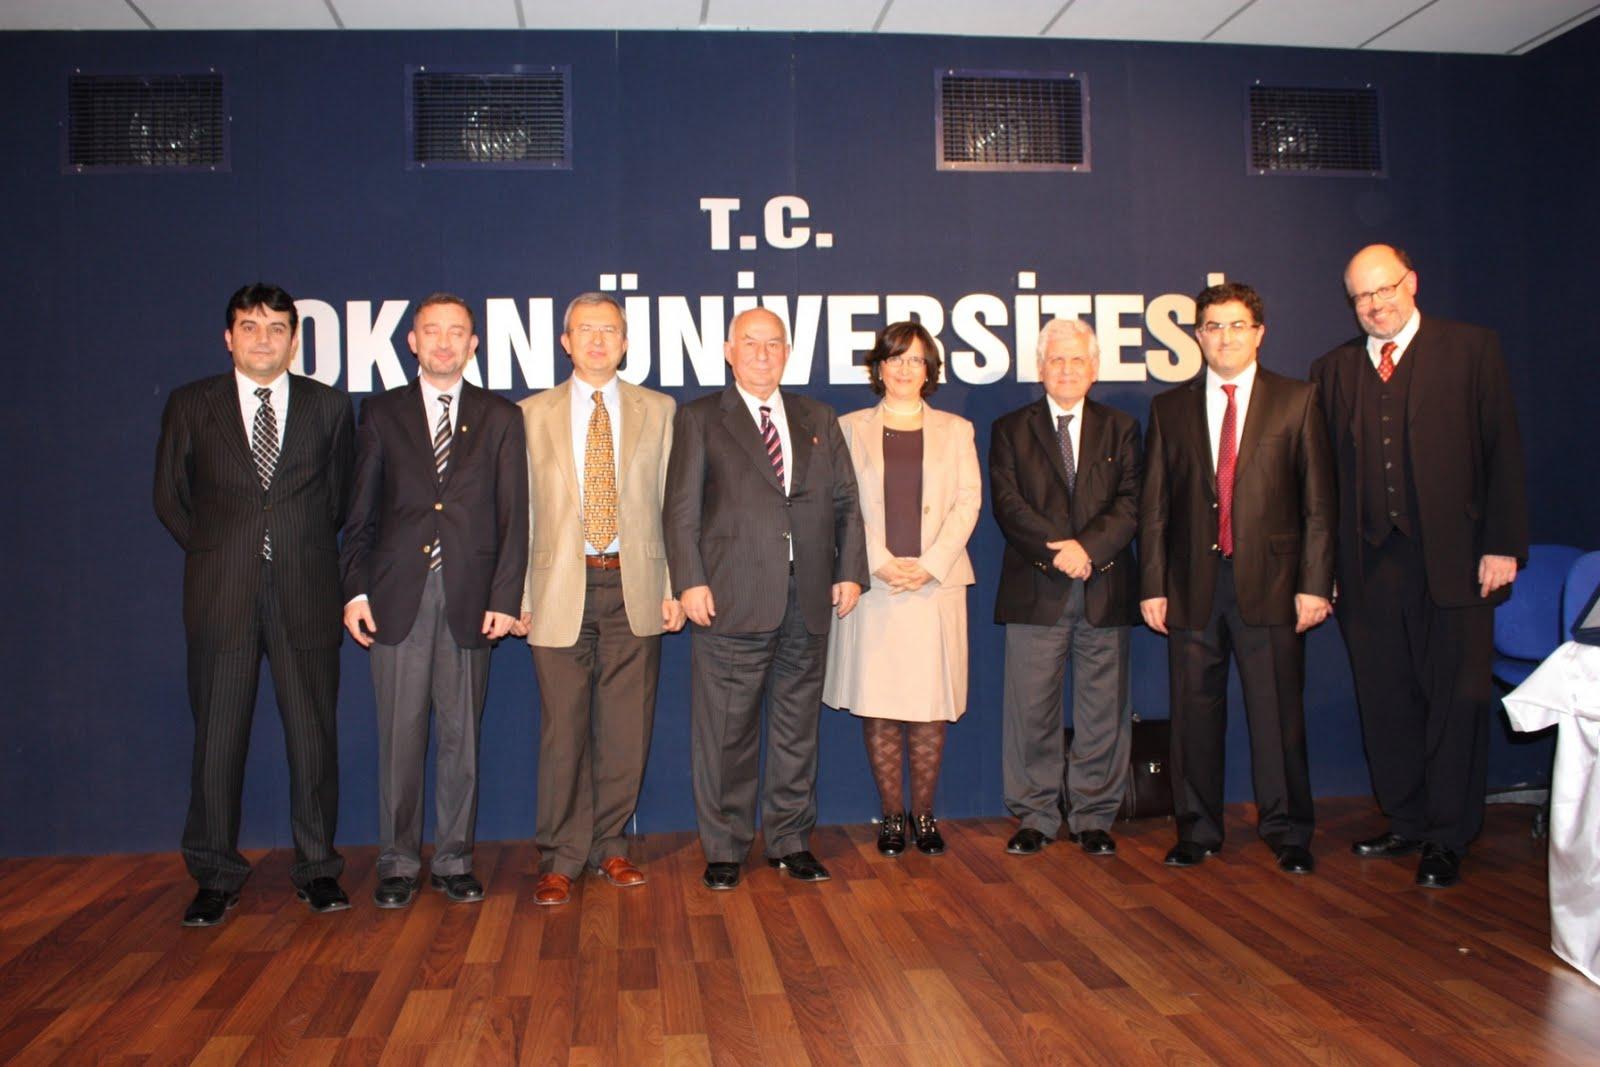 manifesto pr events creative turk hukuku ve karsilastirmali hukukta af sorunu okan universitesi nde masaya yatirildi